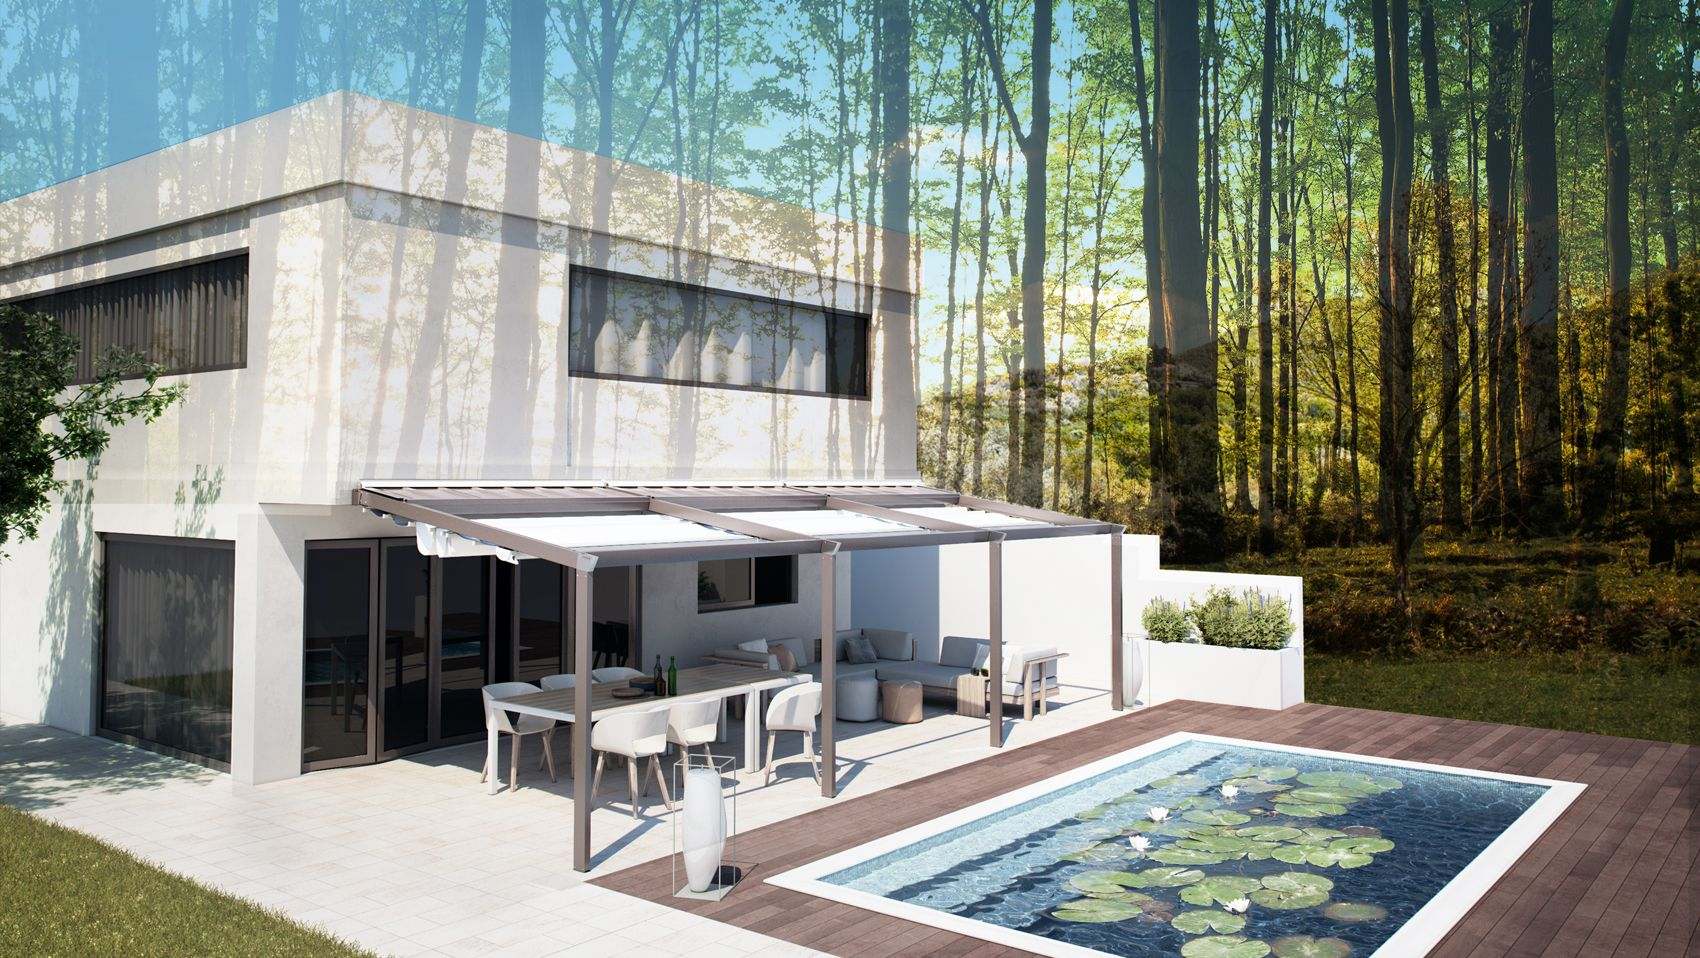 Corradi - Outdoor Living Space | Outdoor furniture design ... on Corradi Living Space id=98889